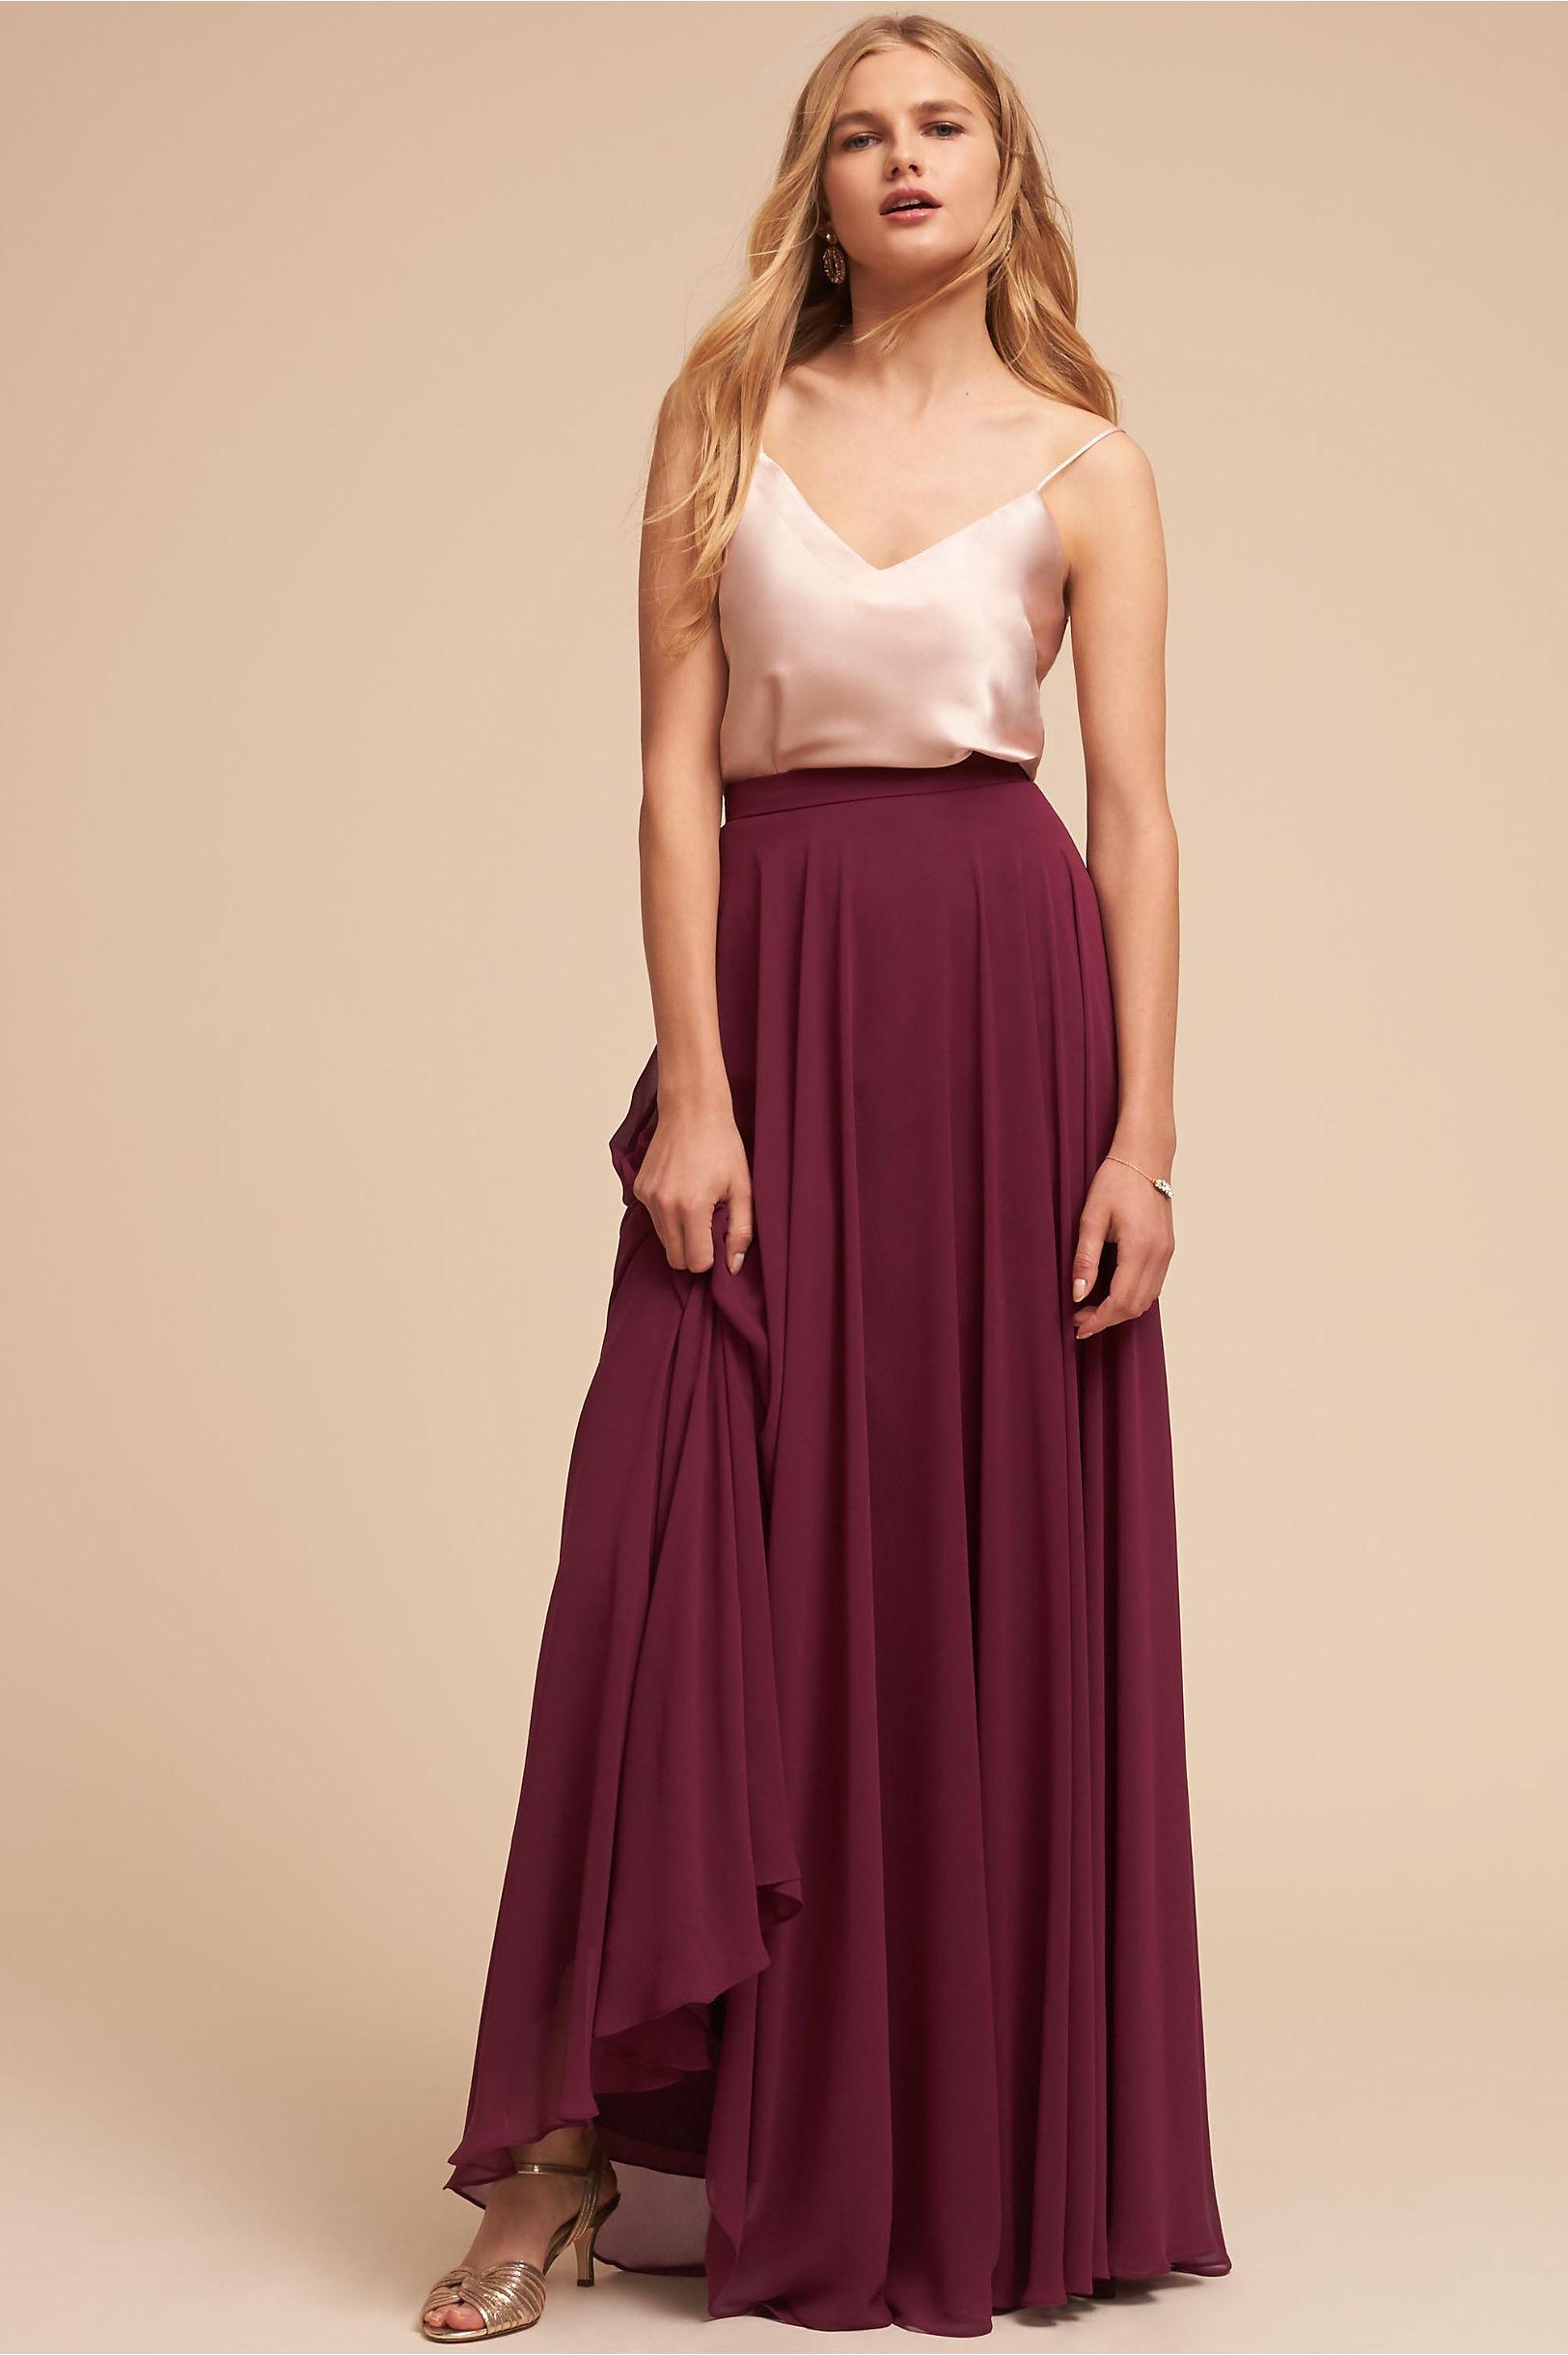 Metallic silver gold bridesmaid dresses bhldn laurel cami top hampton skirt ombrellifo Image collections